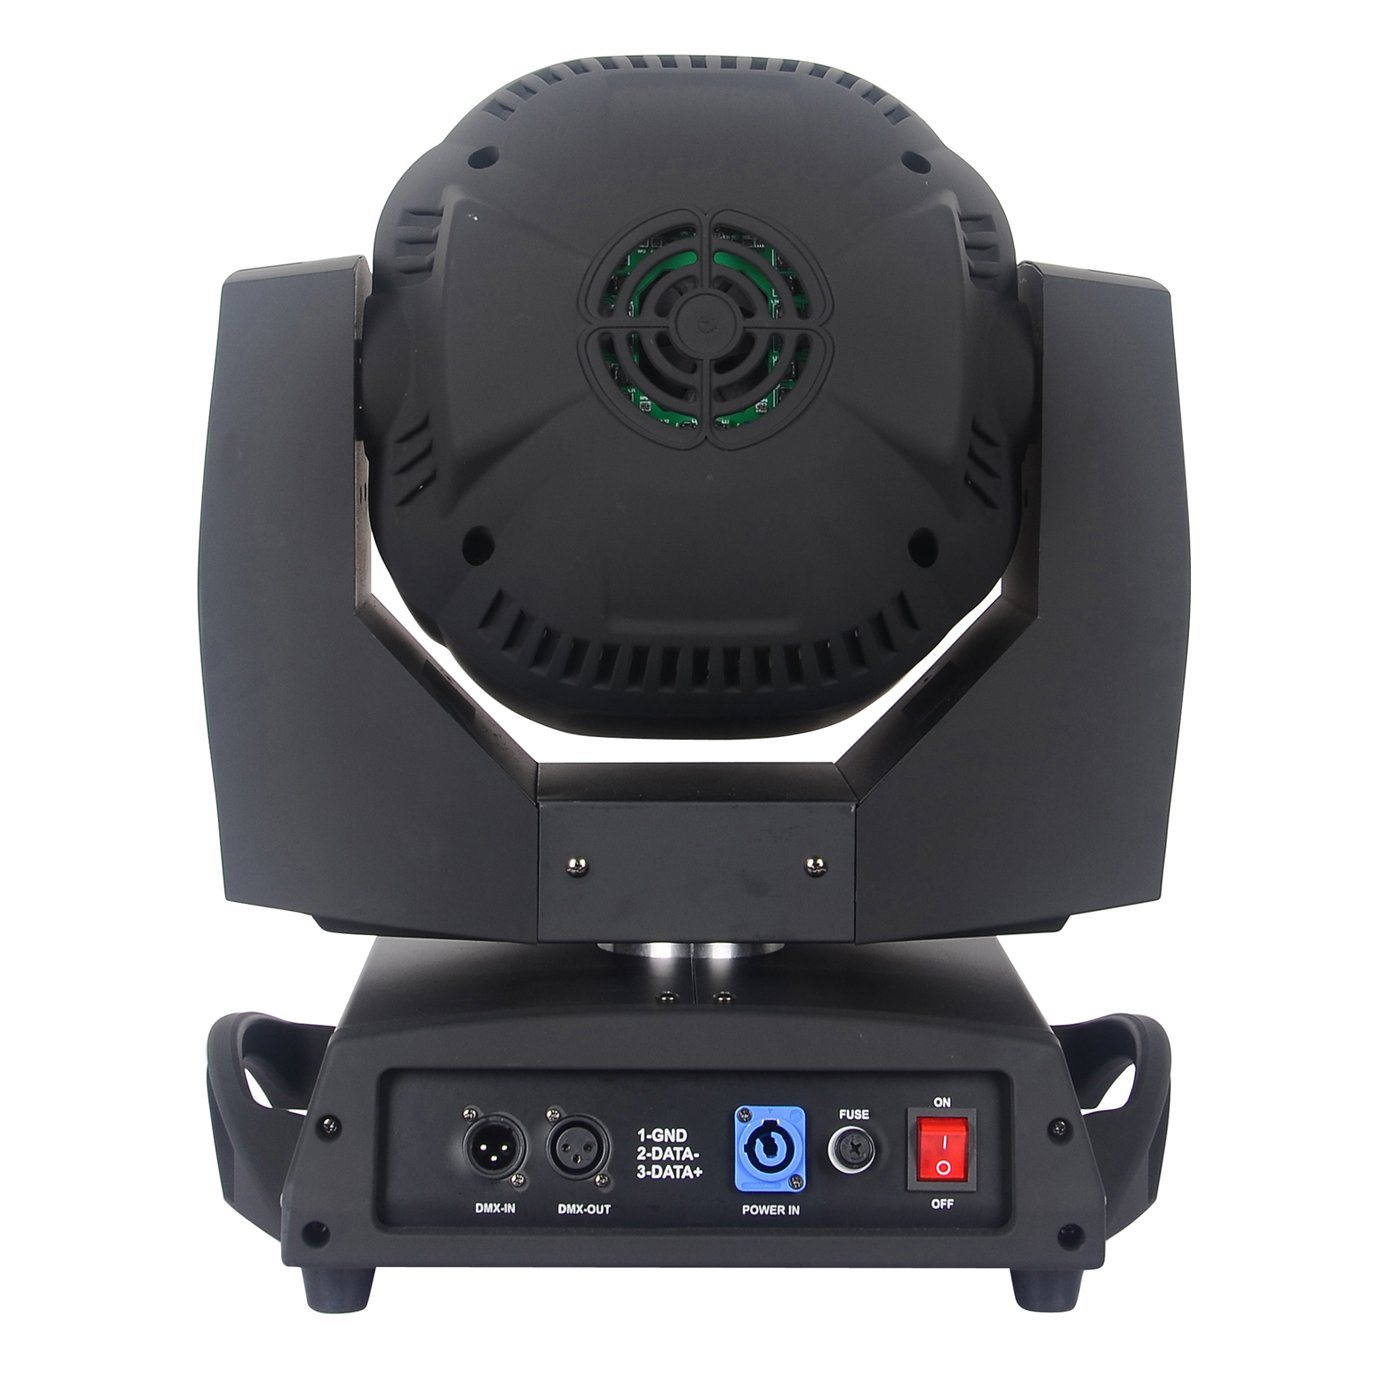 Big Eye 19X15W RGBW LED Moving Head Light with Zoom Beam Wash Effect